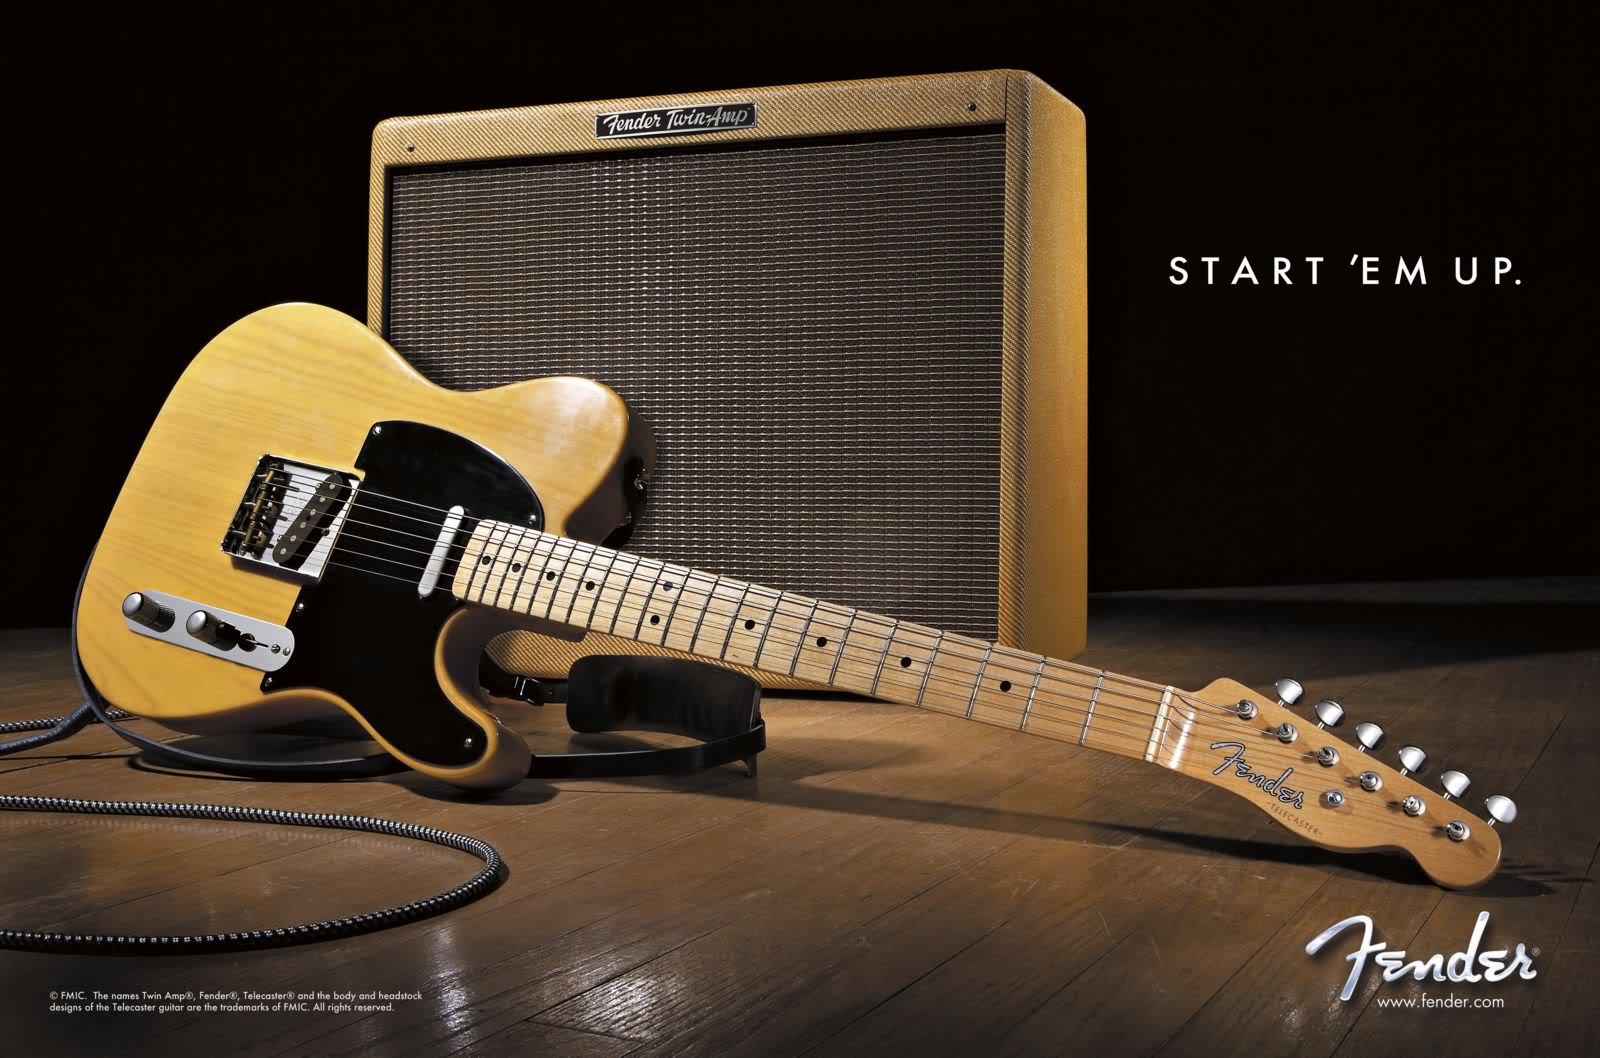 Fender Telecaster Fotos Y Wallpapers Enchufa La Guitarra